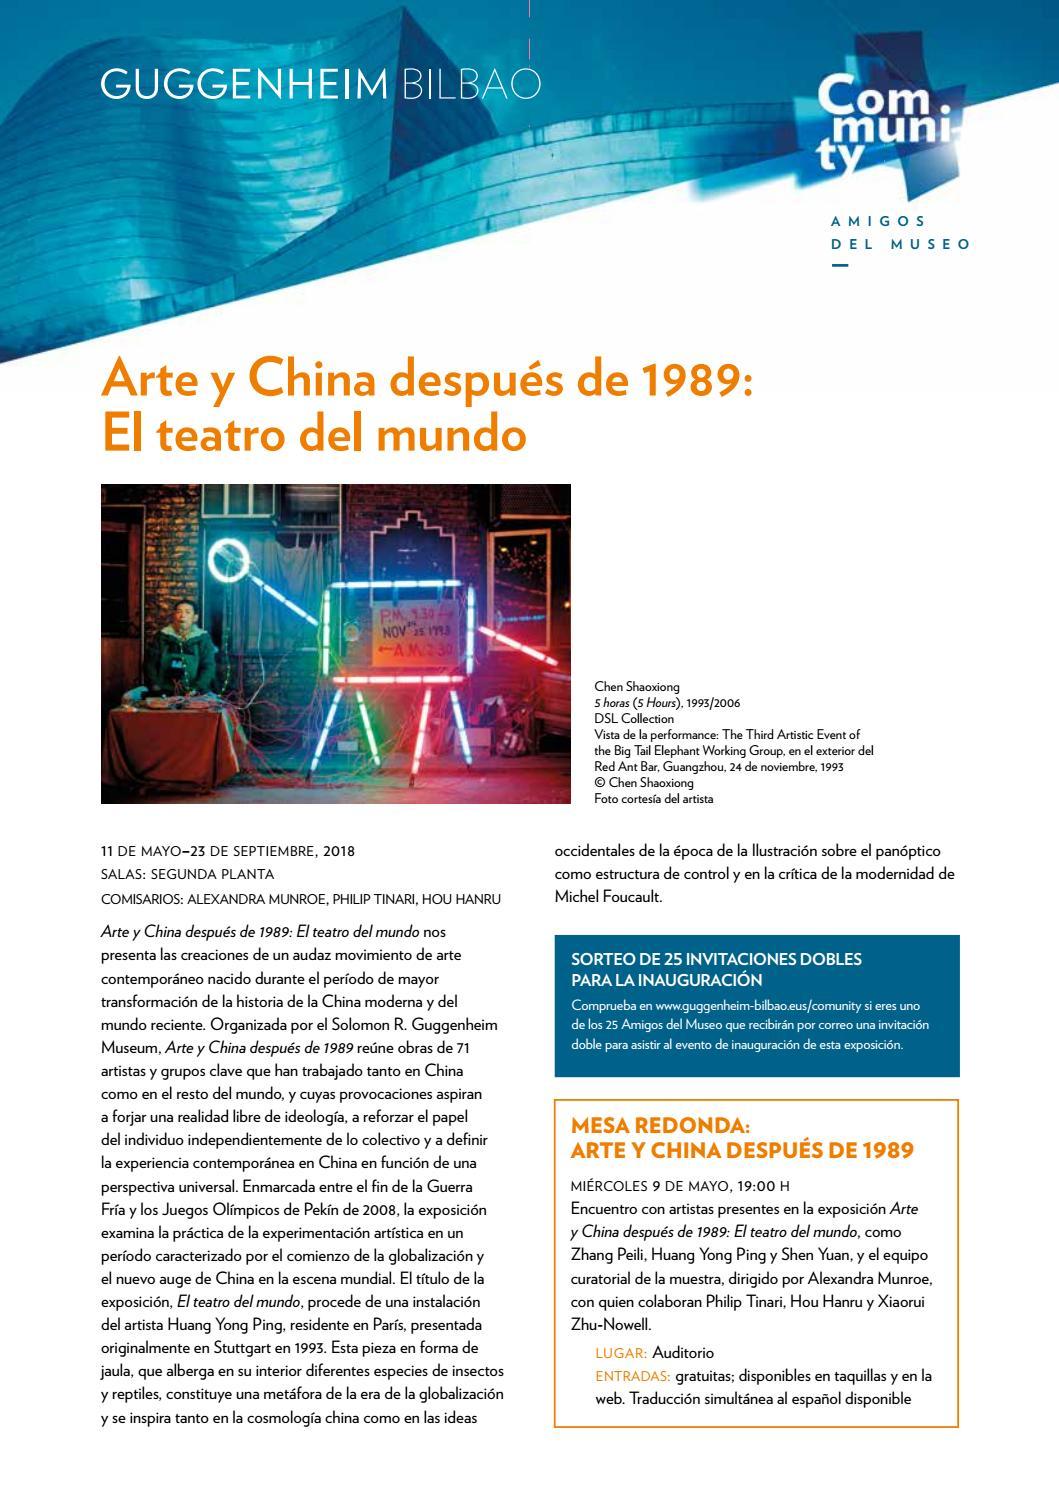 Comunicado Mayo 2018 By Museo Guggenheim Bilbao Issuu